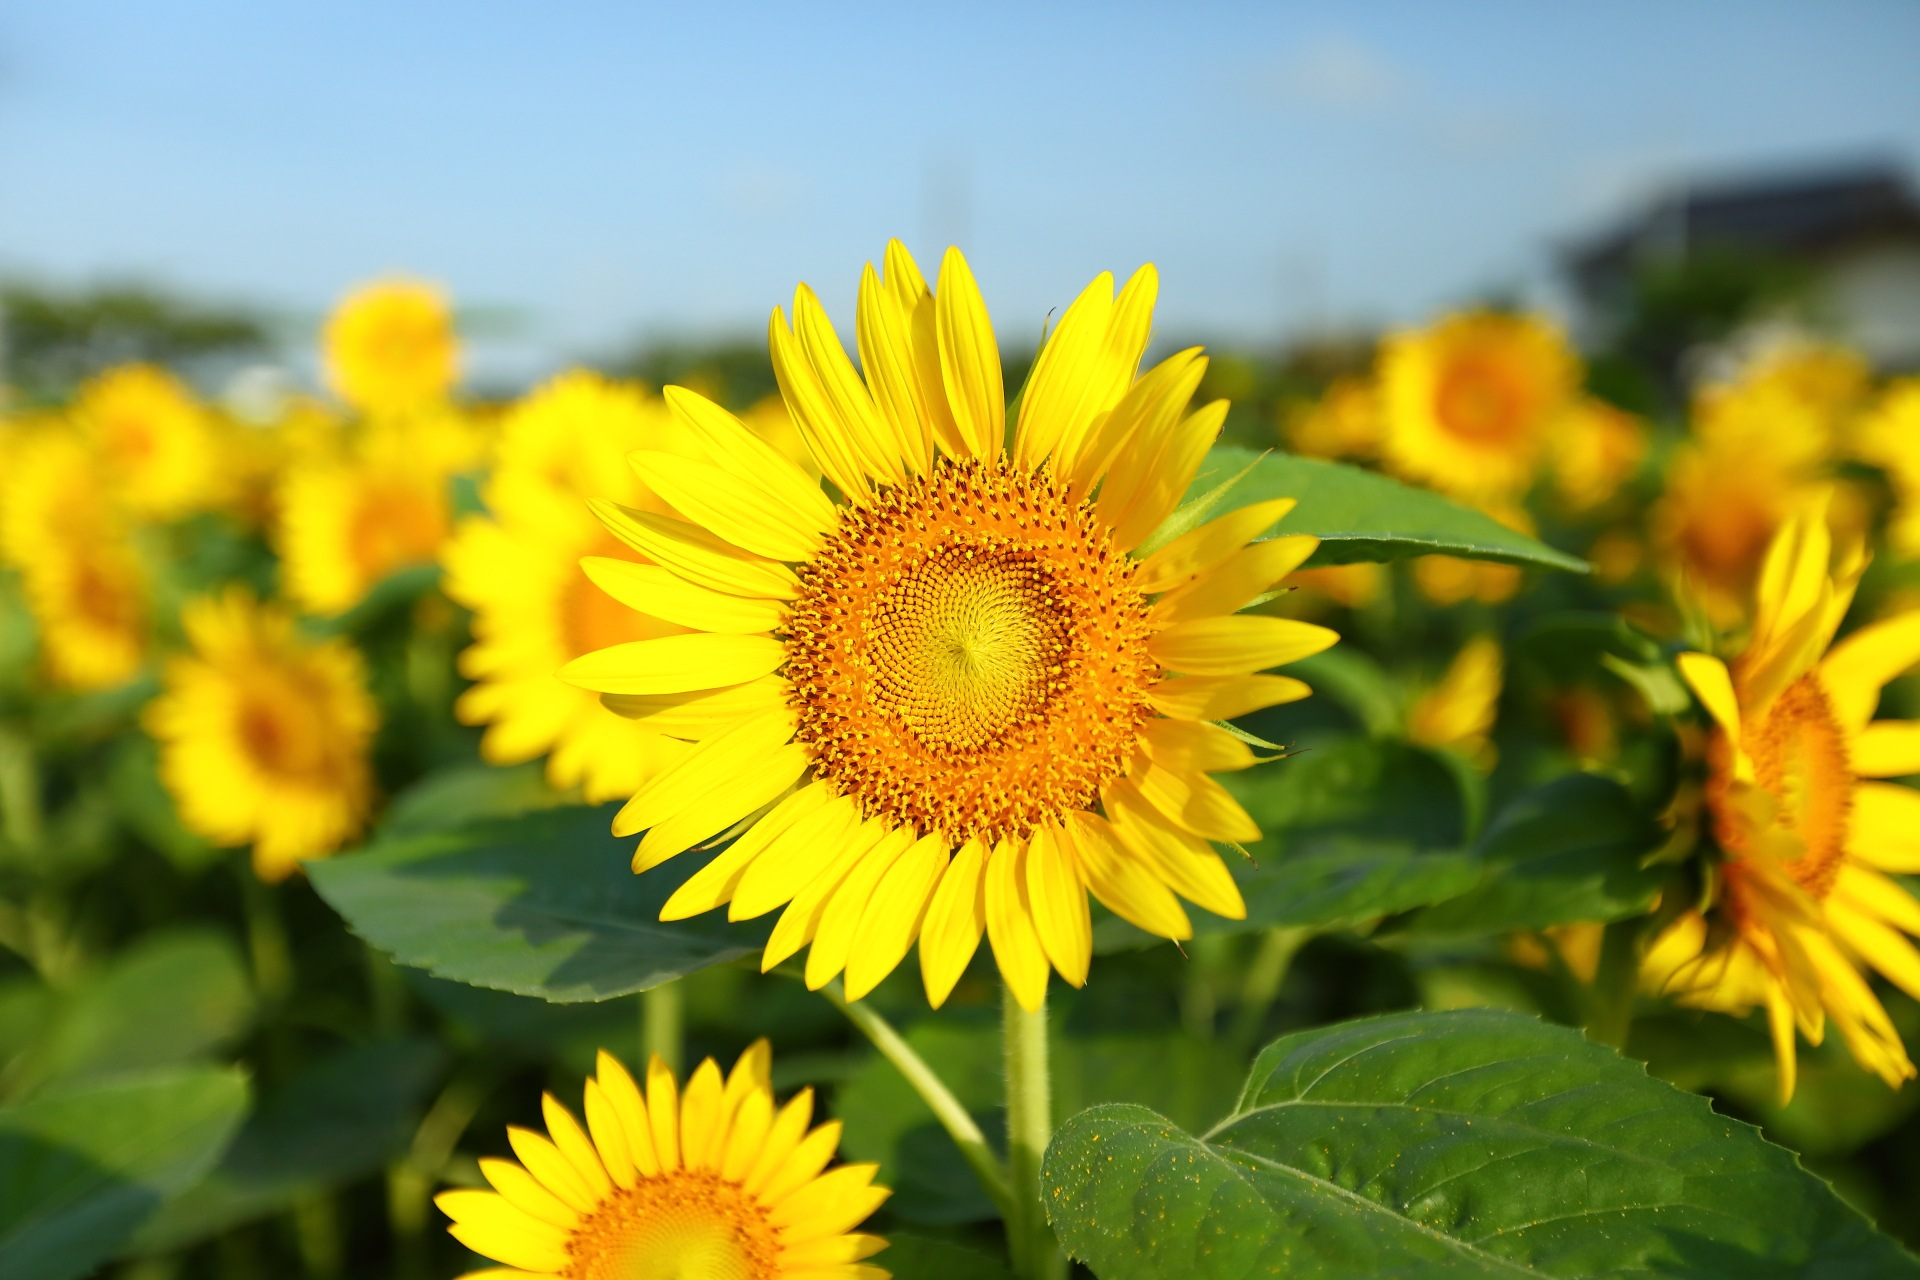 Sunflower by takashi.mizoguchi